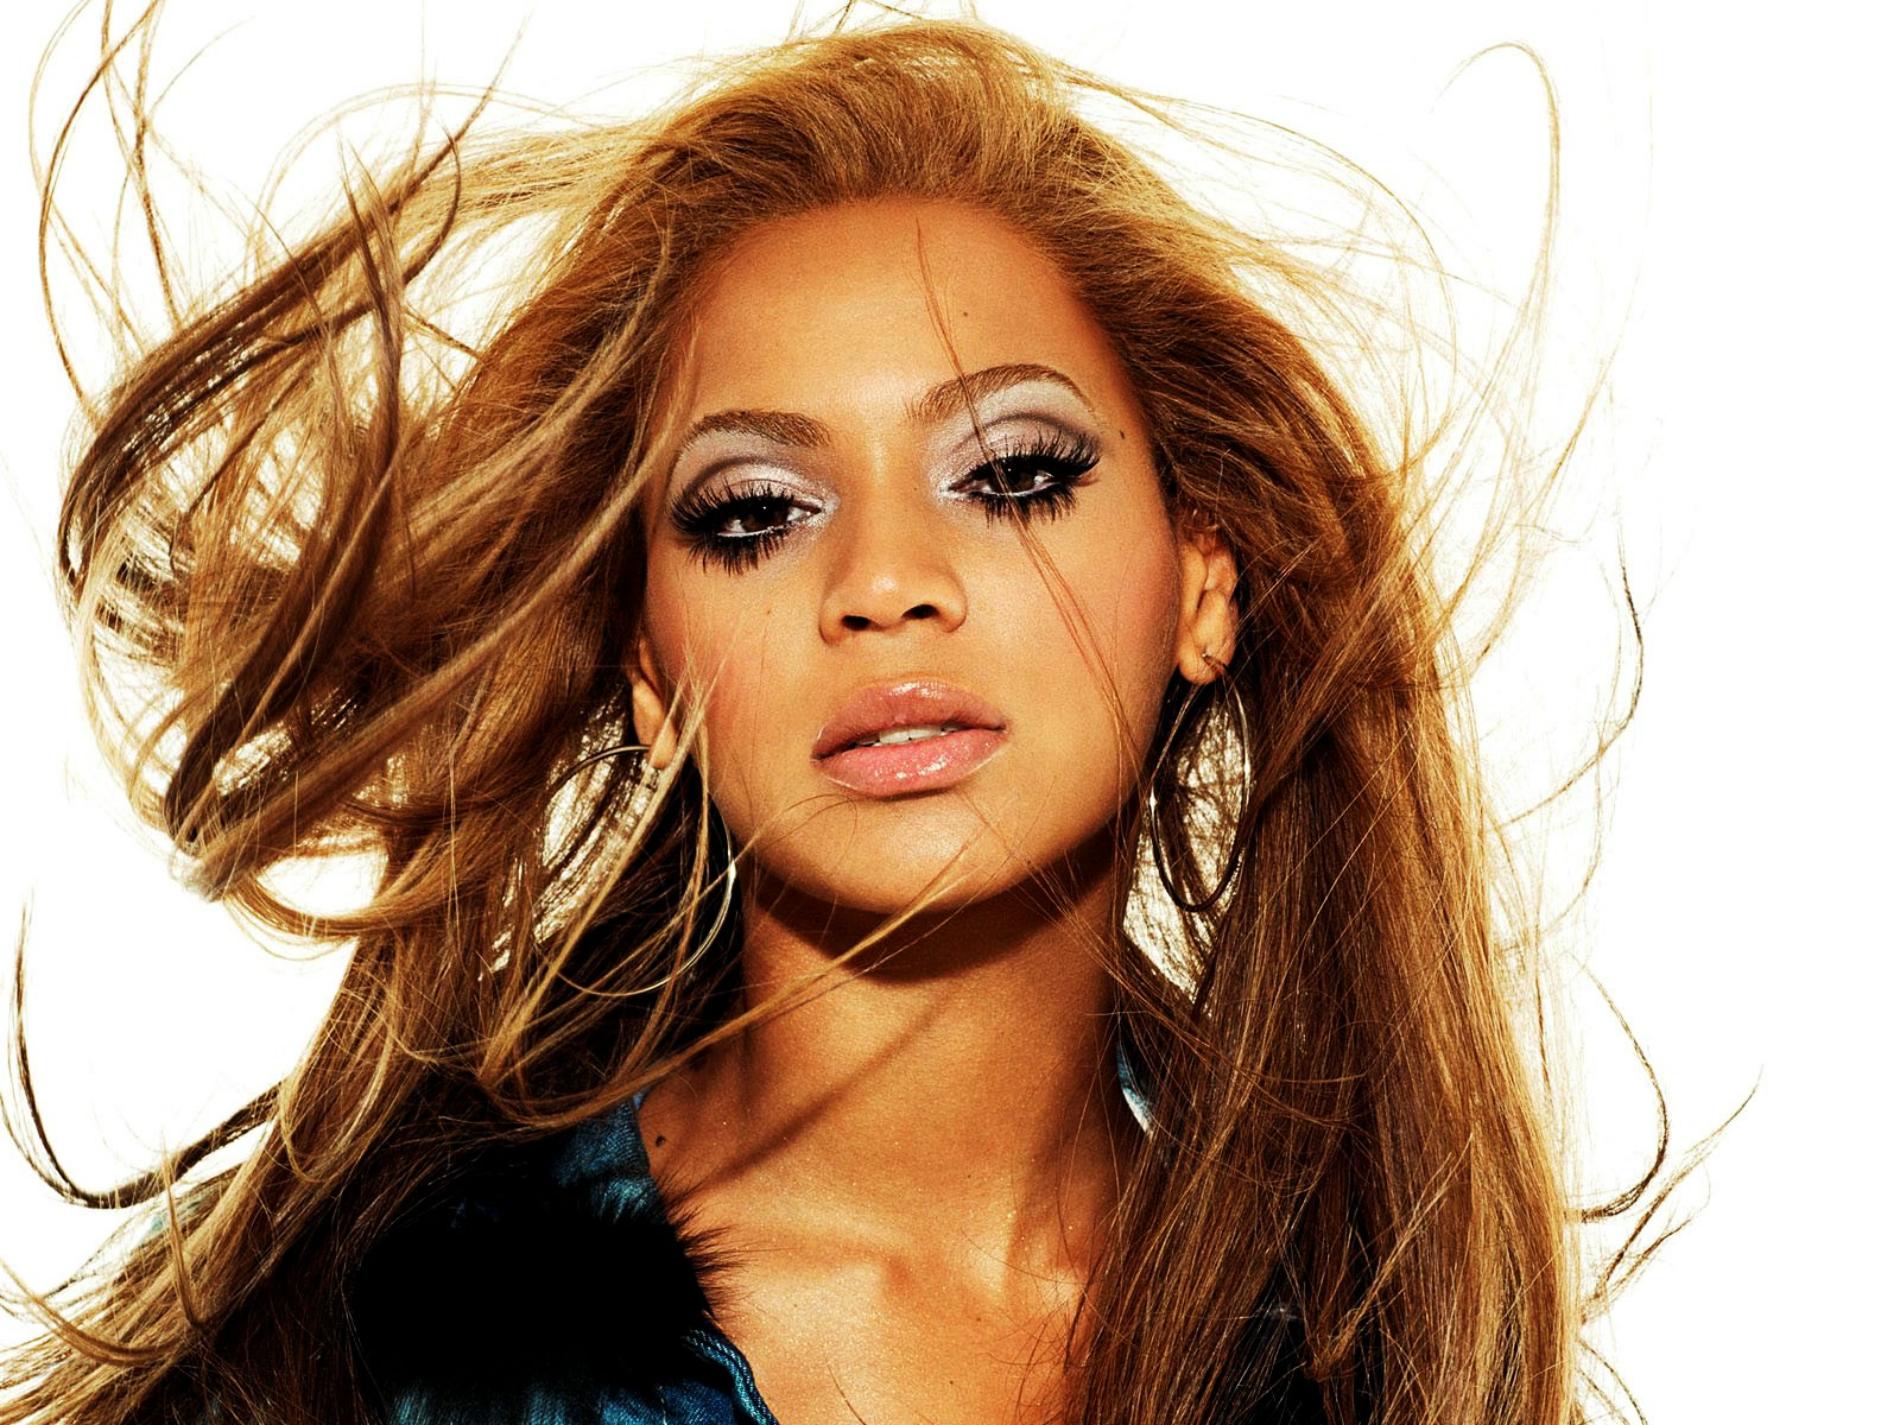 http://2.bp.blogspot.com/-Qzx8DOD_2QE/UREtkNJo0NI/AAAAAAAAHJA/HufedtxbAUU/s2000/Beyonce-Waving-Hair-HD-Wallpaper-Vvallpaper.Net.jpg